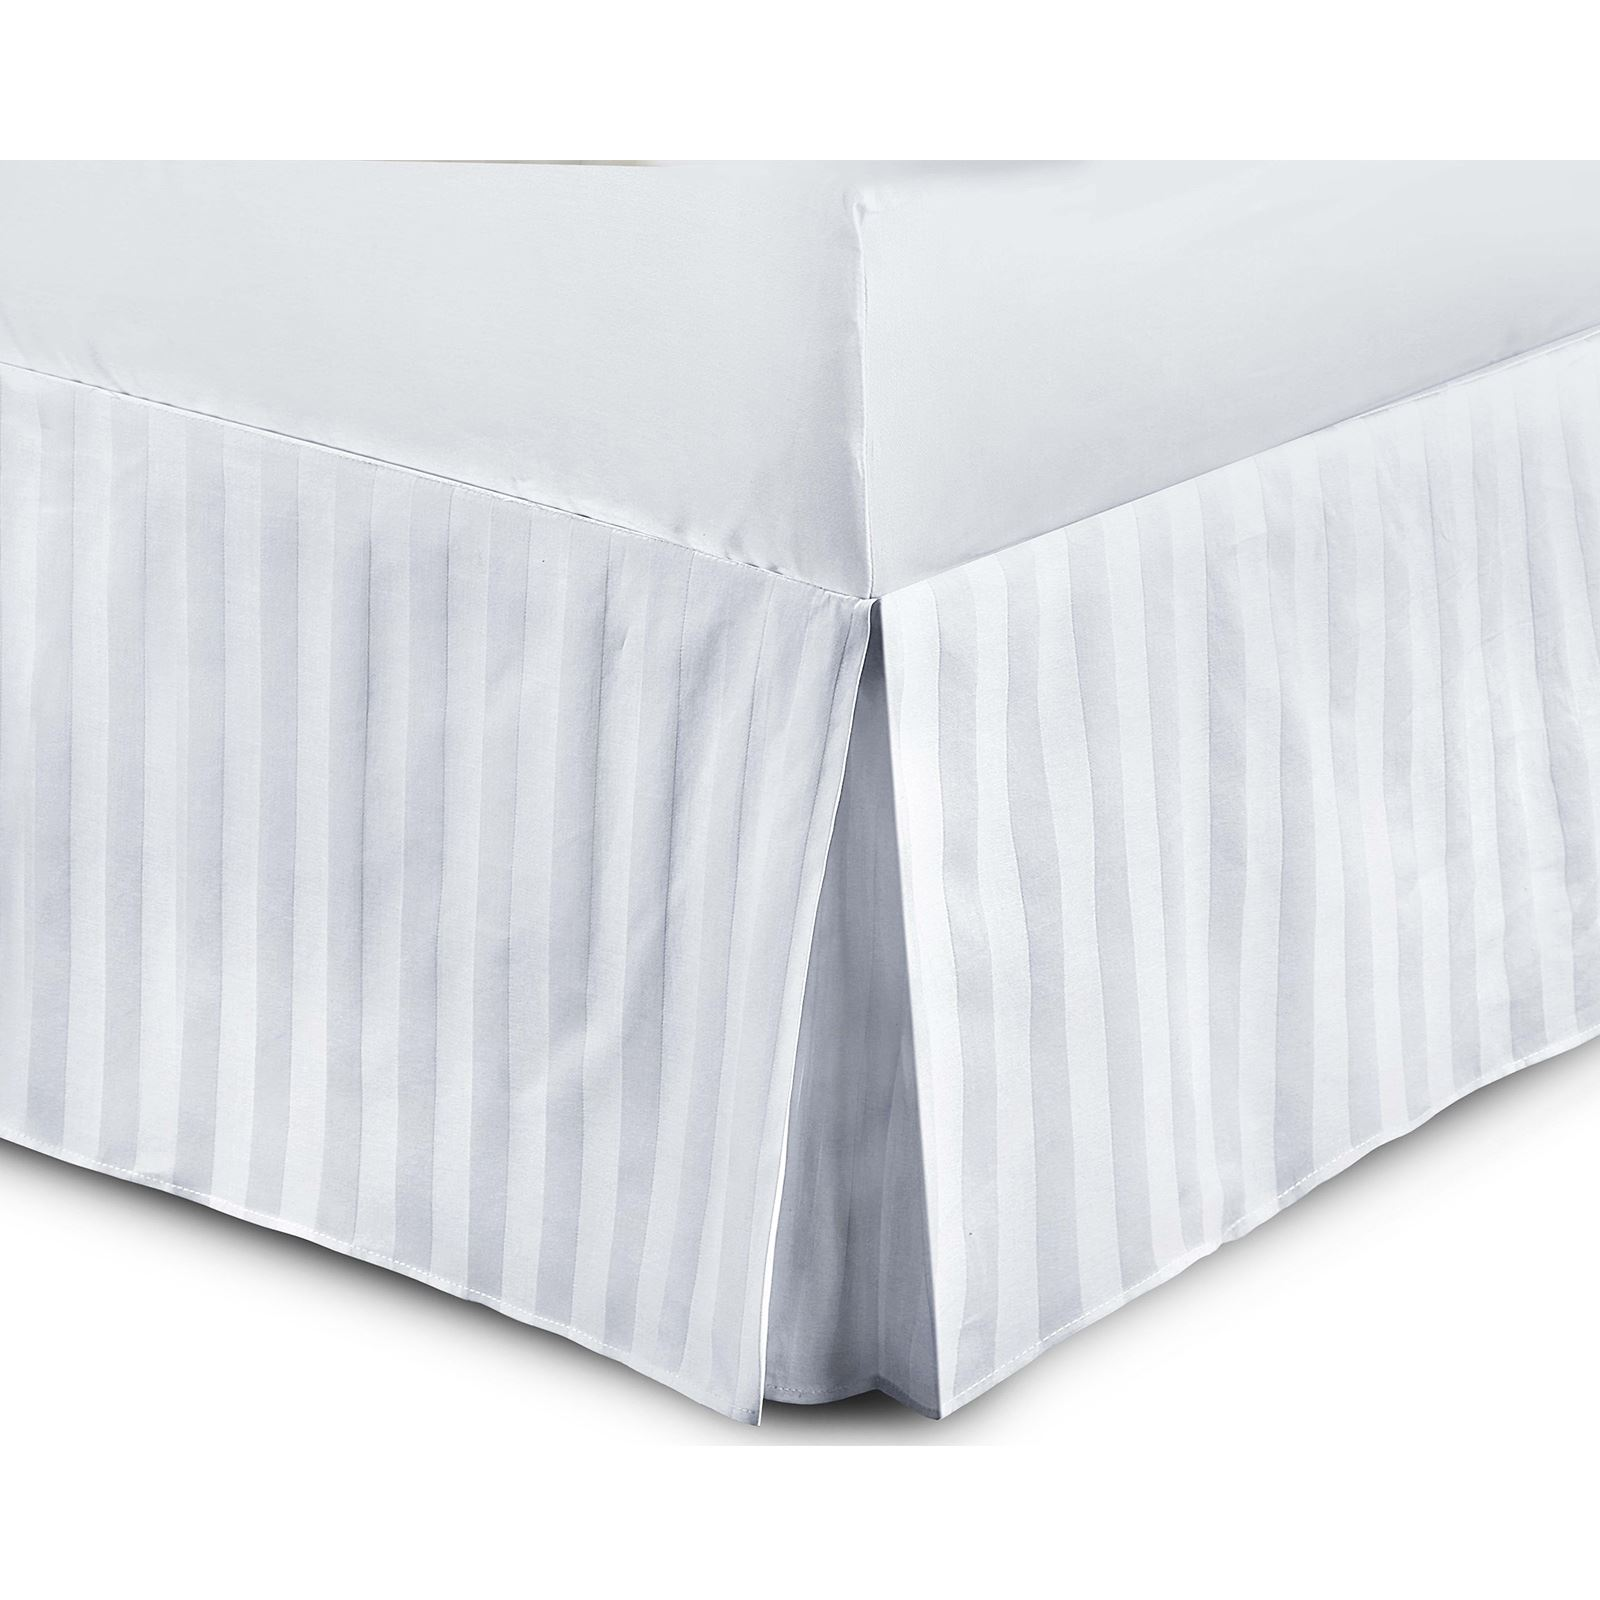 100-algodon-egipcio-de-lujo-a-rayas-Satin-funda-de-edredon-cabido-hoja-plana-Cenefa miniatura 19